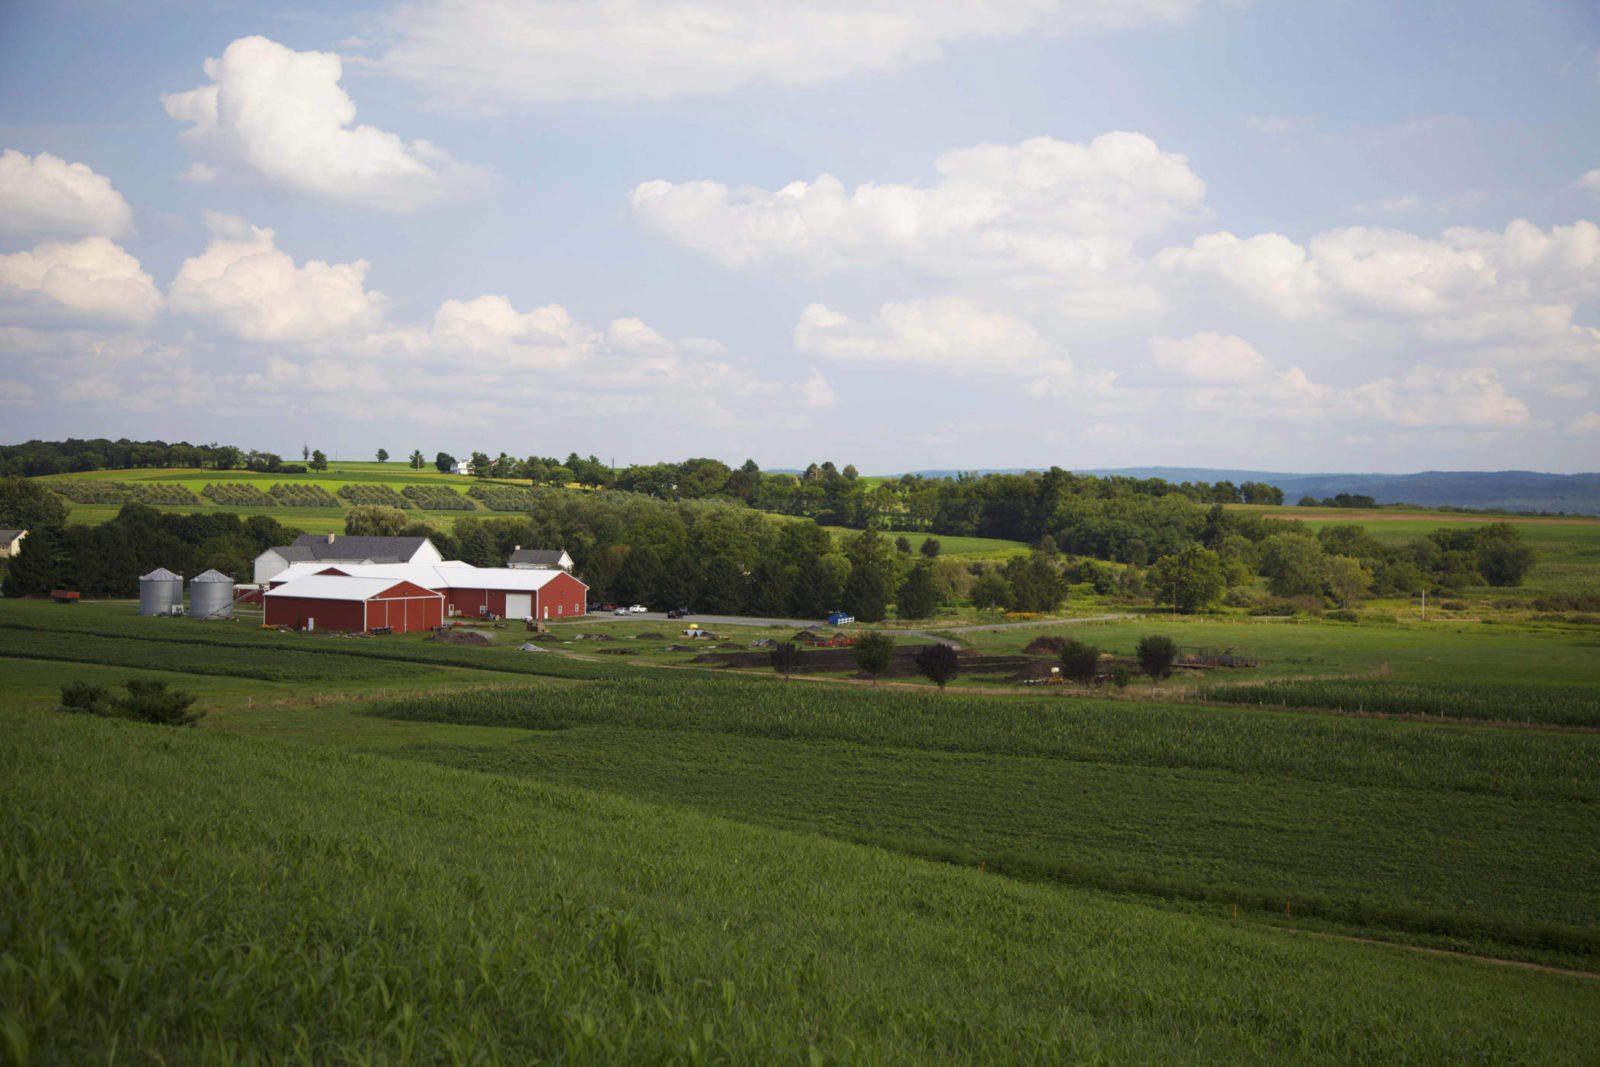 Rodale Institute Farm in Kutztown, Pennsylvania